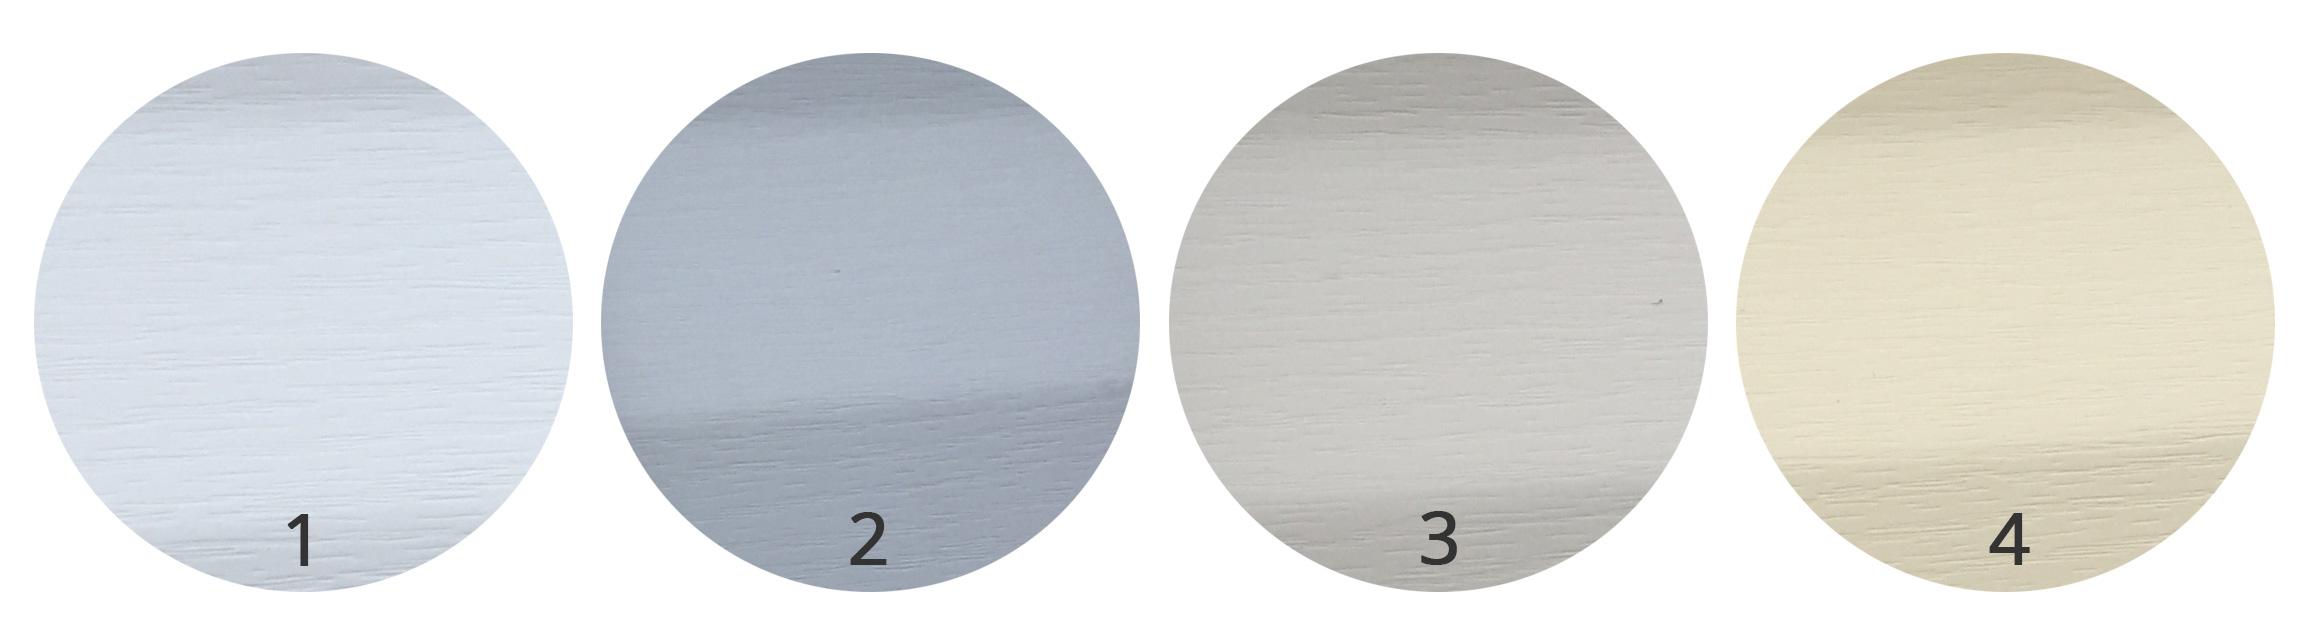 Produit Nettoyage Bardage Pvc bardage pvc | clin vinyle couleurs pastel